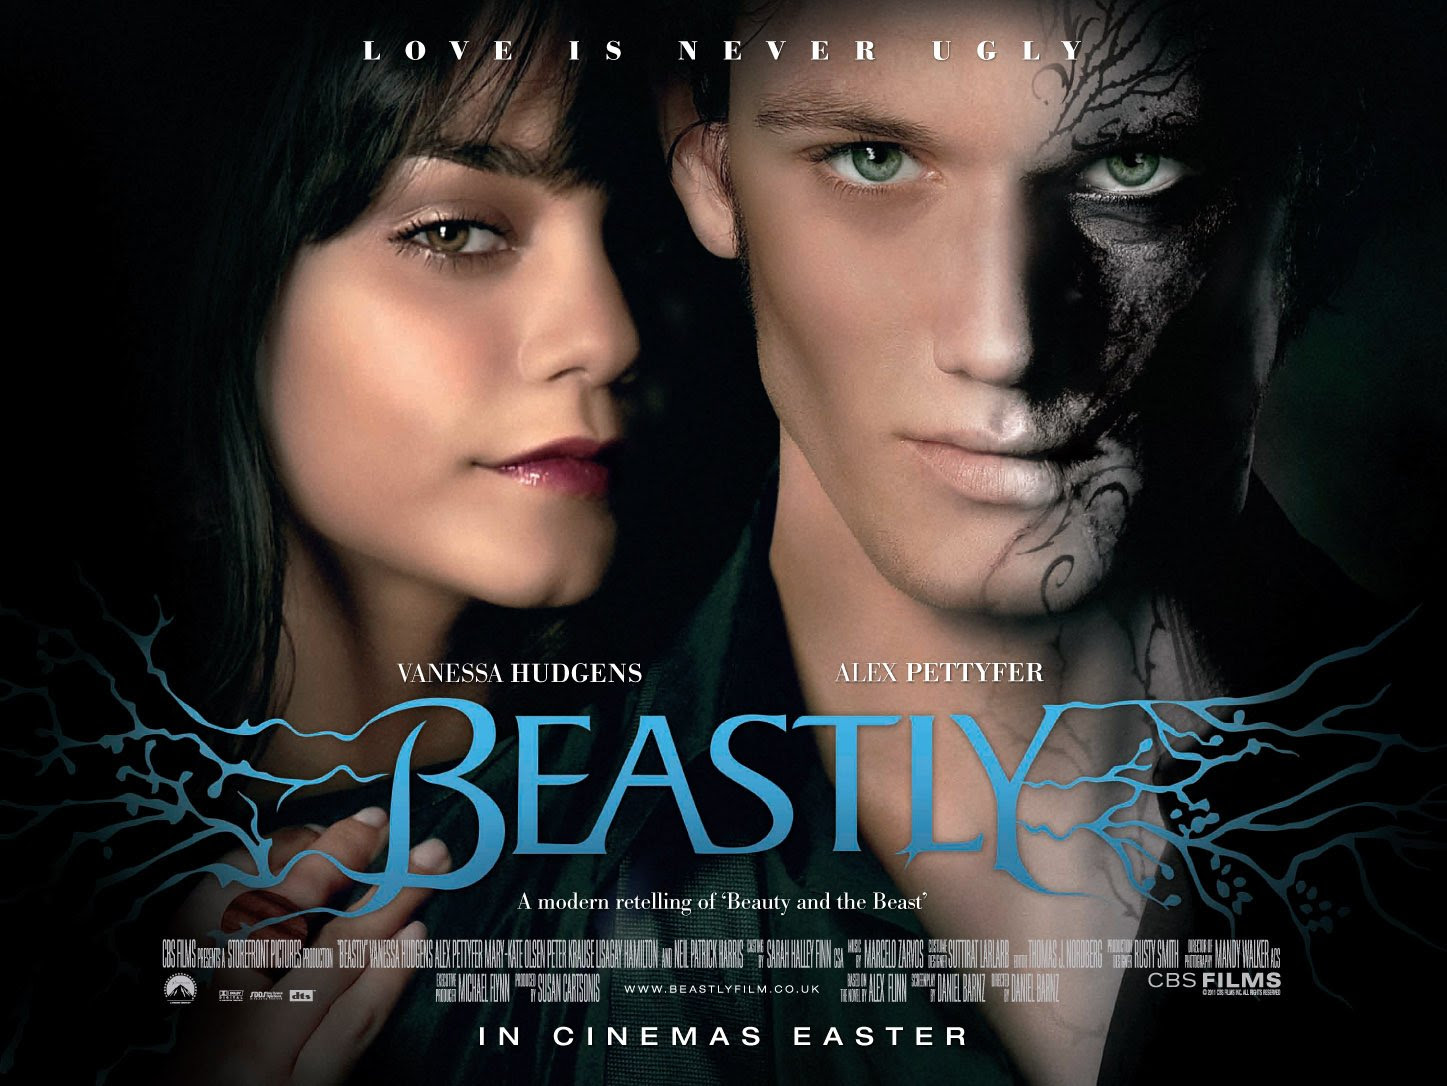 Znalezione obrazy dla zapytania beastly movie poster